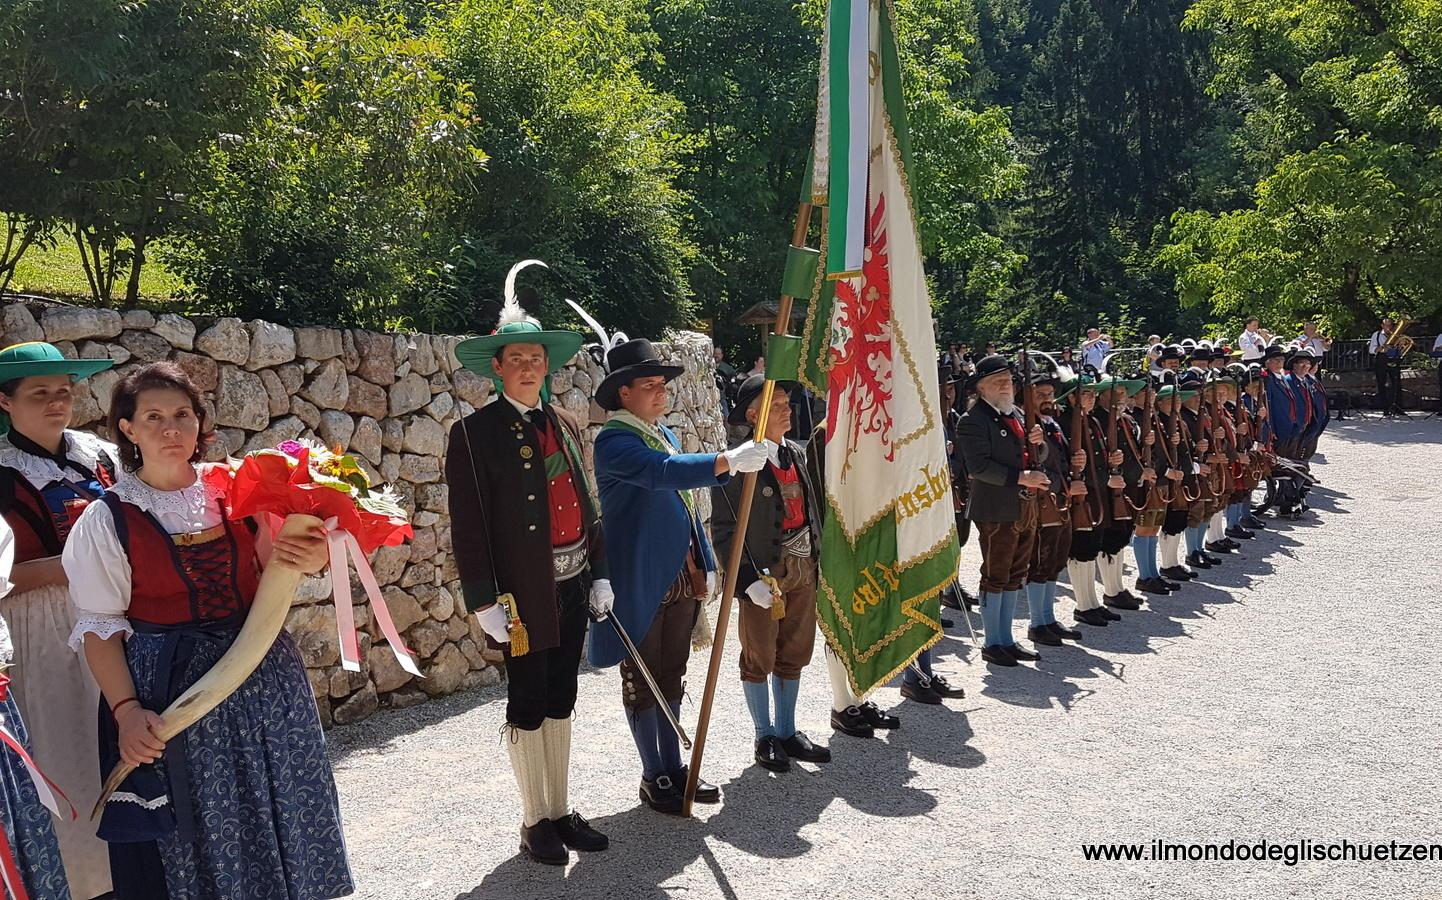 2017_Sankt Romedius Nonstal Nonsberg_Landesublicher Empfang San Romedio 04